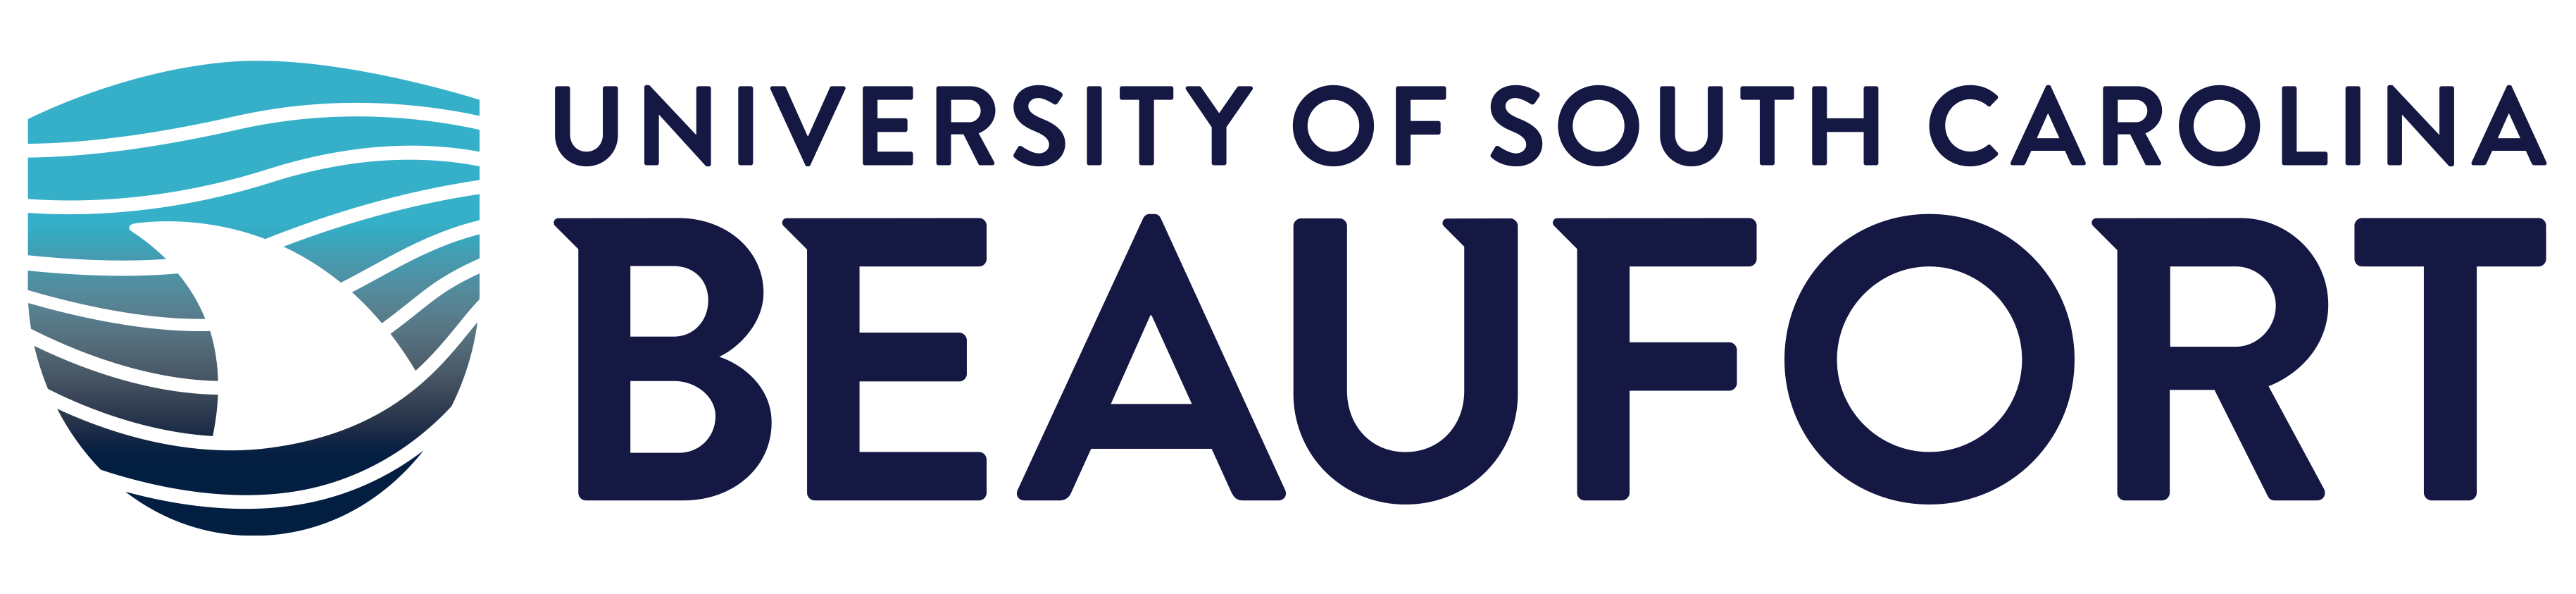 UofSC Beaufort logo